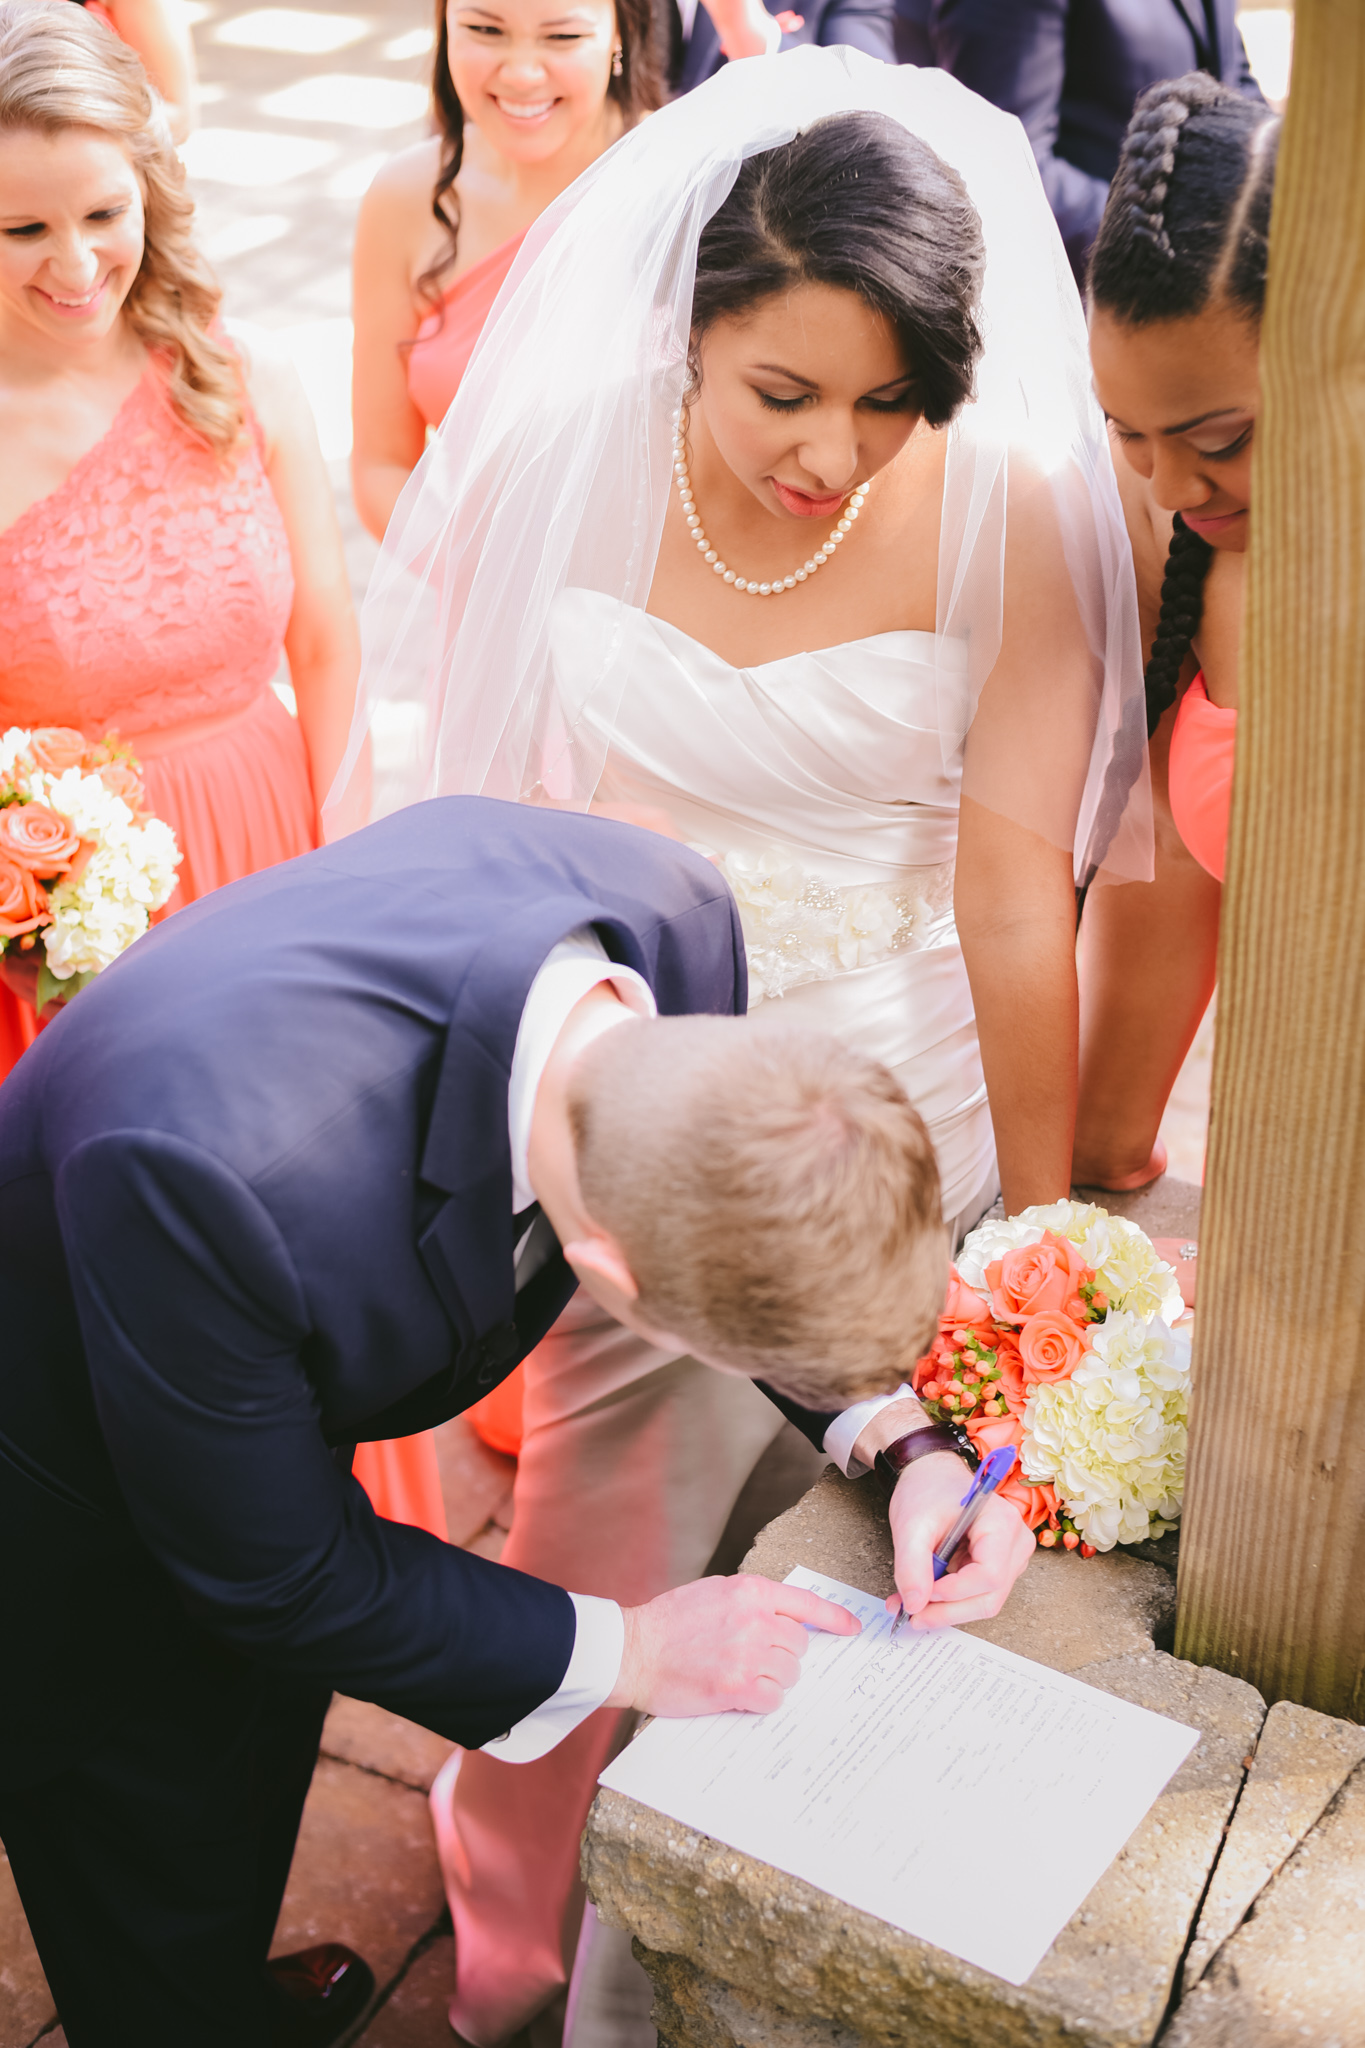 Hozik_Wedding-488.jpg